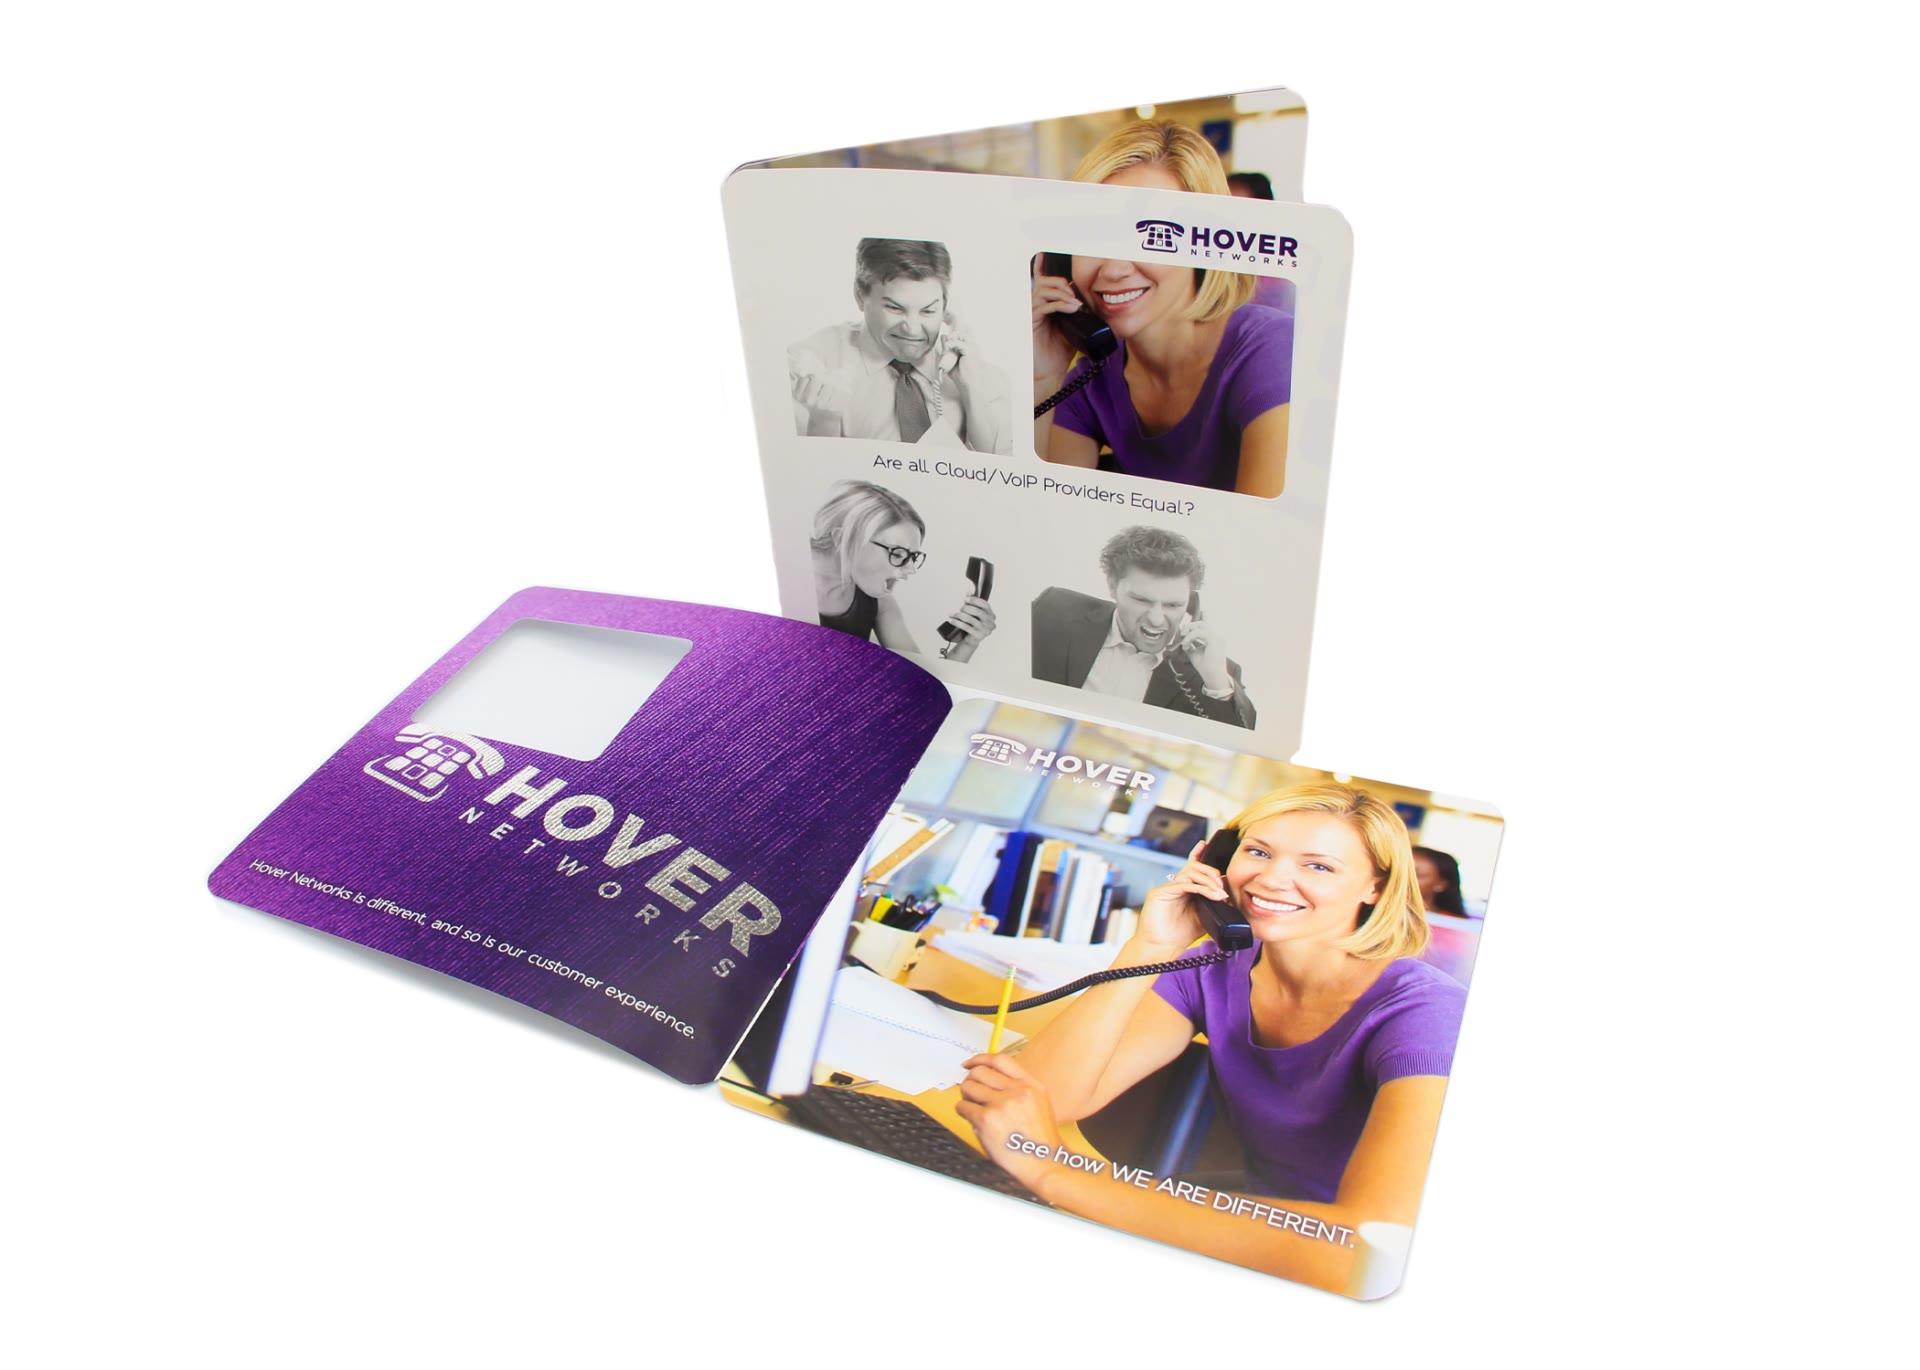 Hover Networks brochure